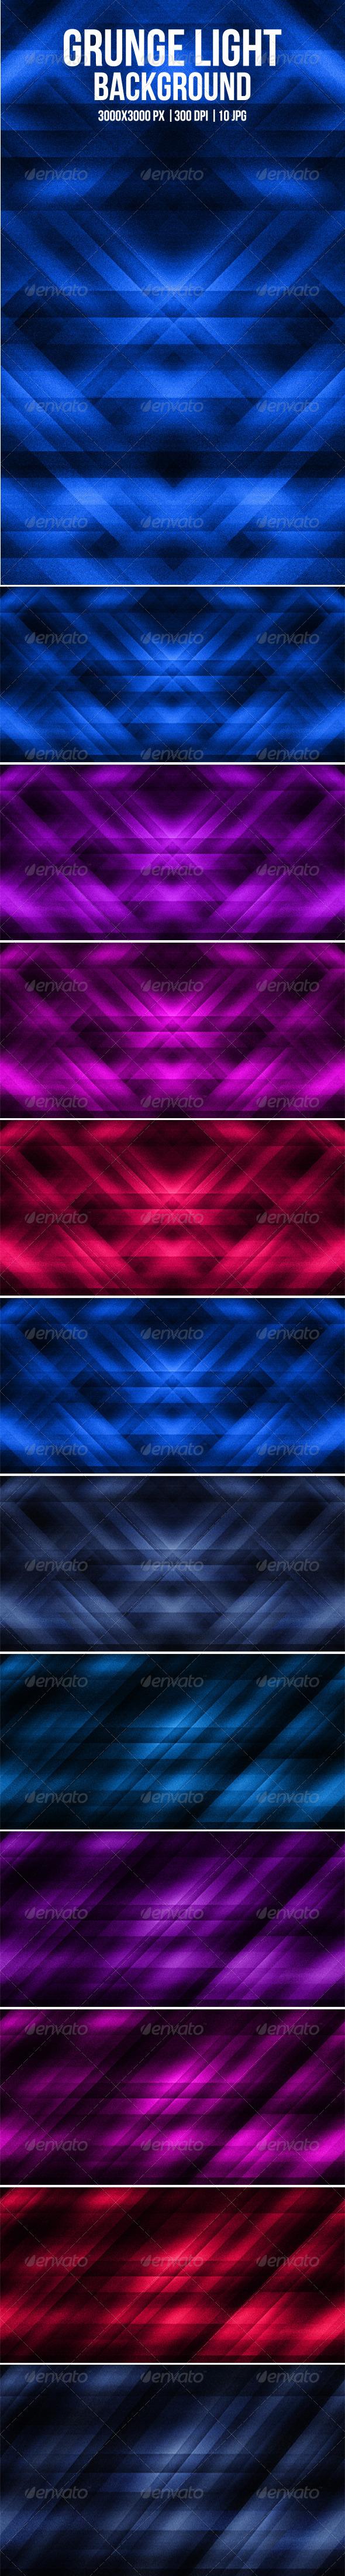 GraphicRiver 10 Grunge Light Background 5649577